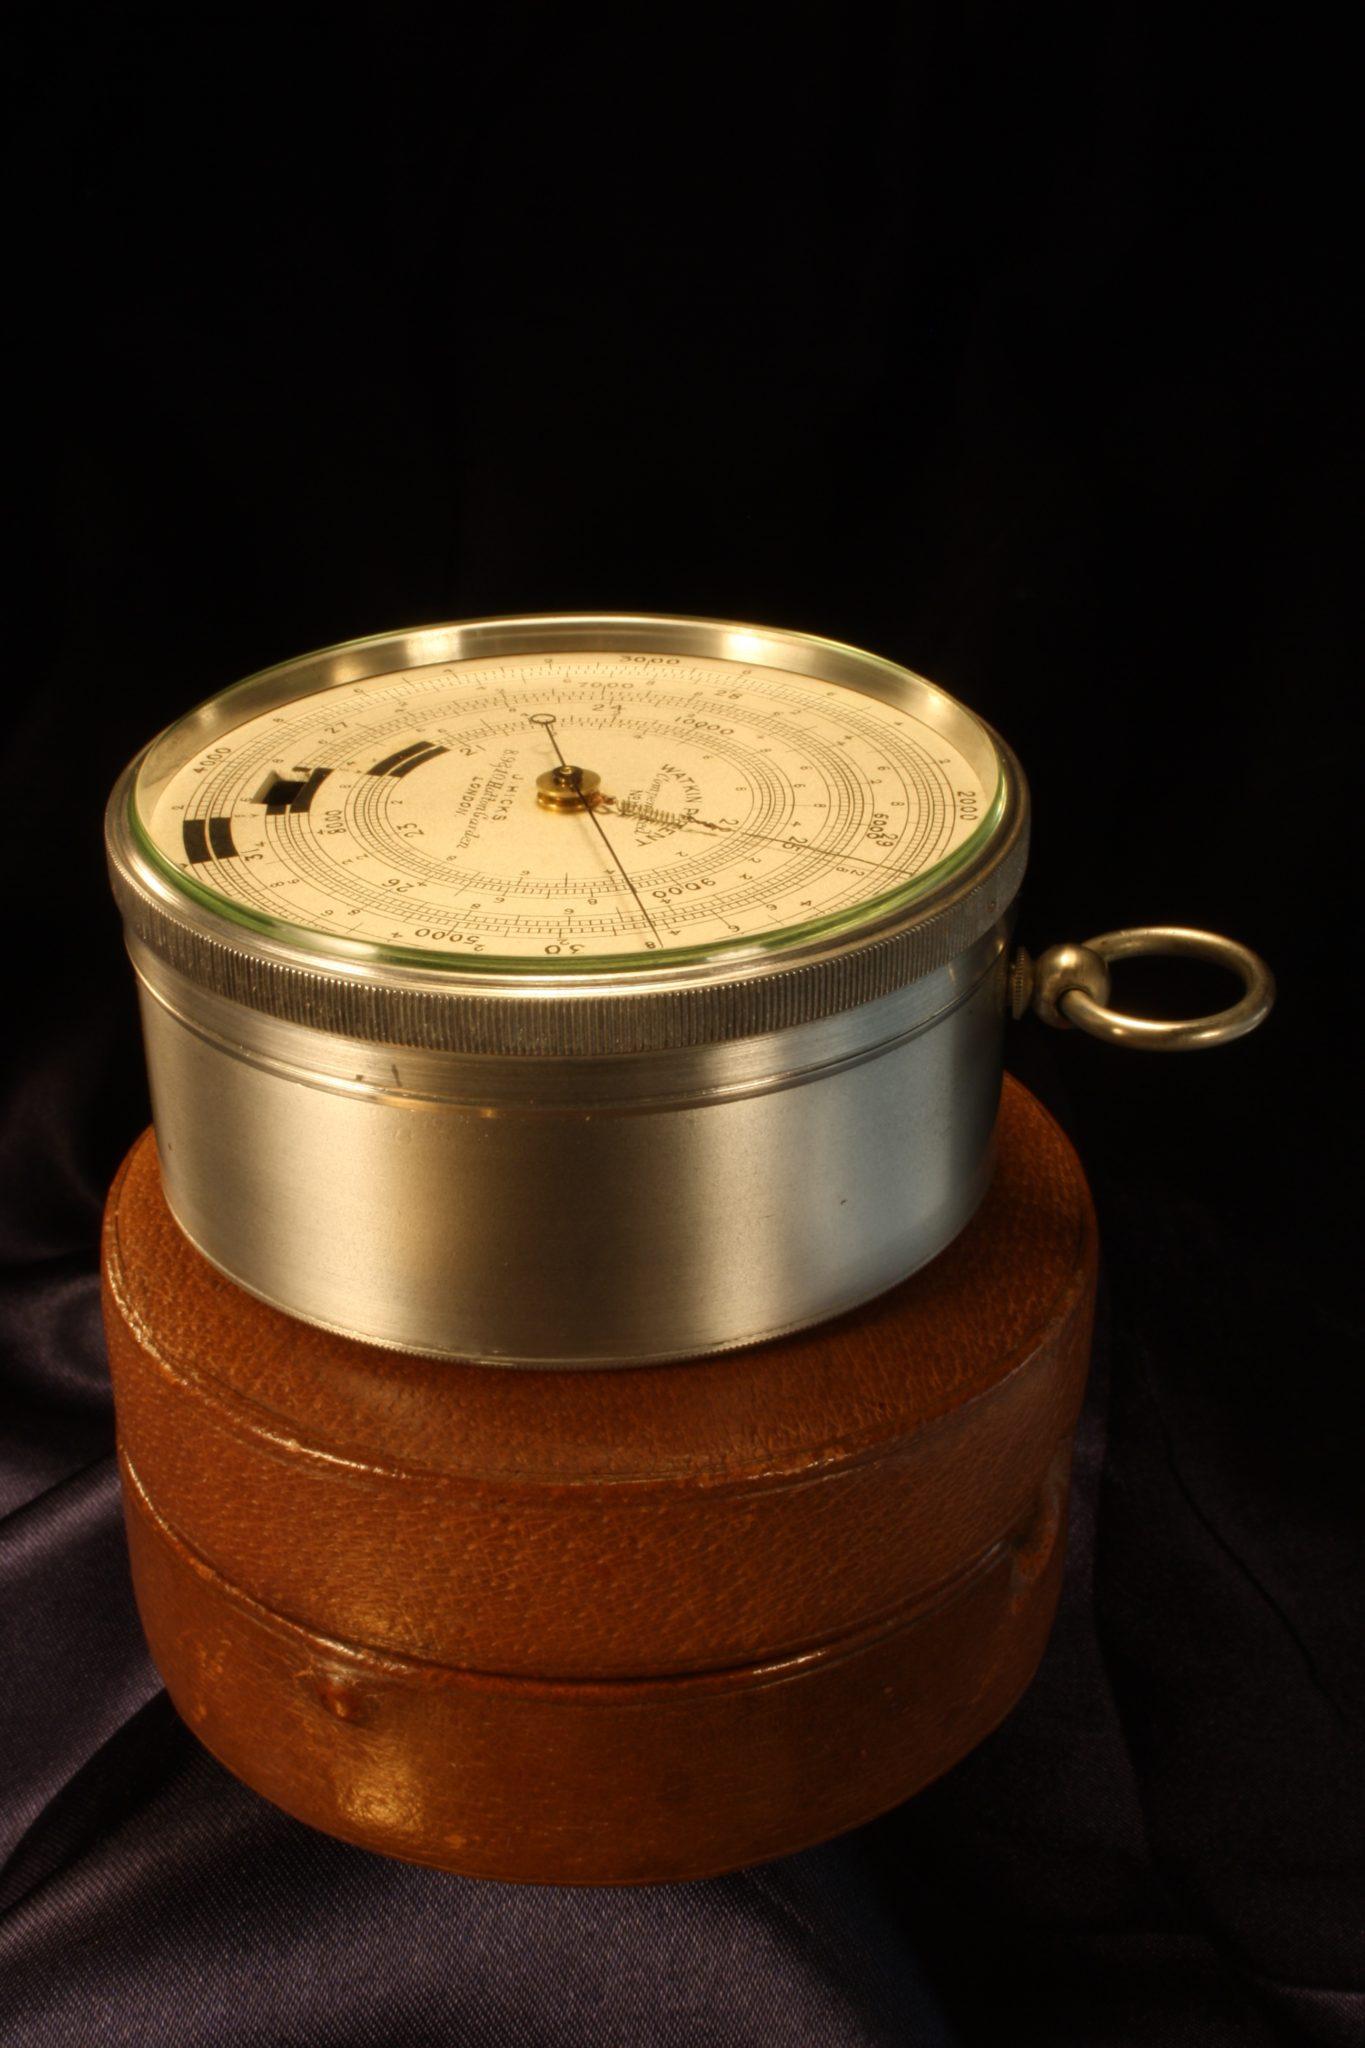 Image of Watkin Patent Hicks Pocket Barometer No 1012